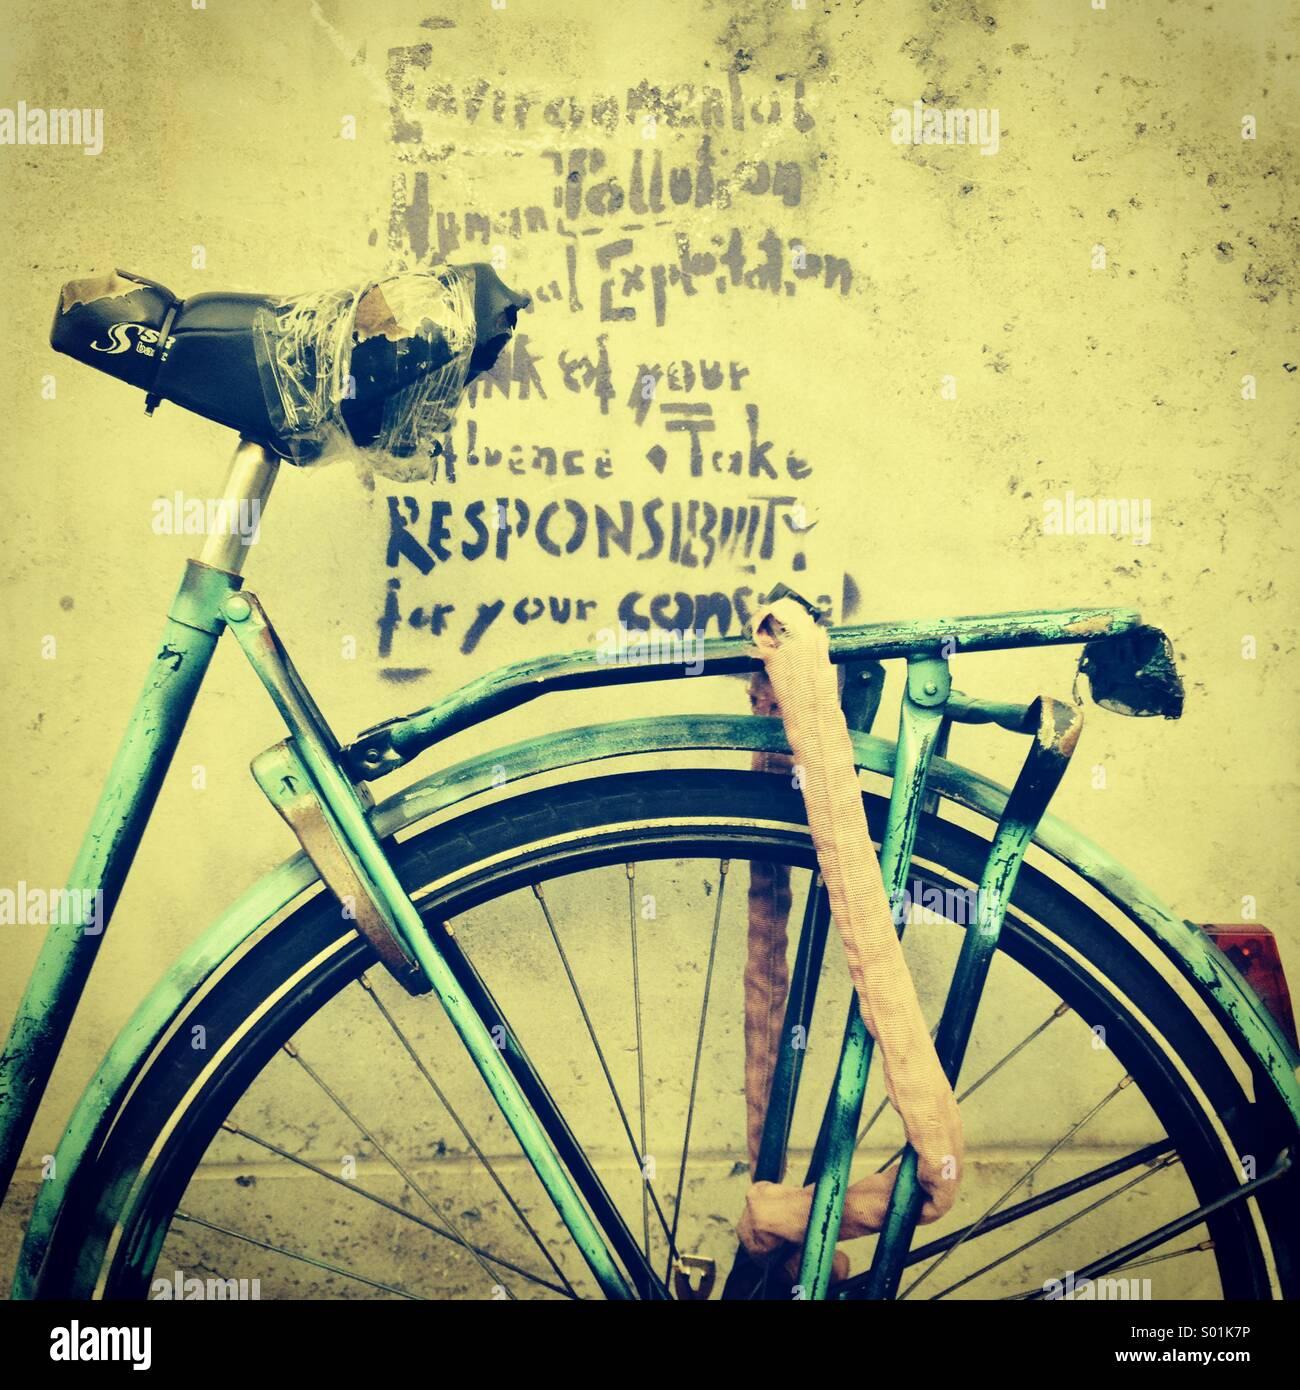 Amsterdam bicycle - Stock Image